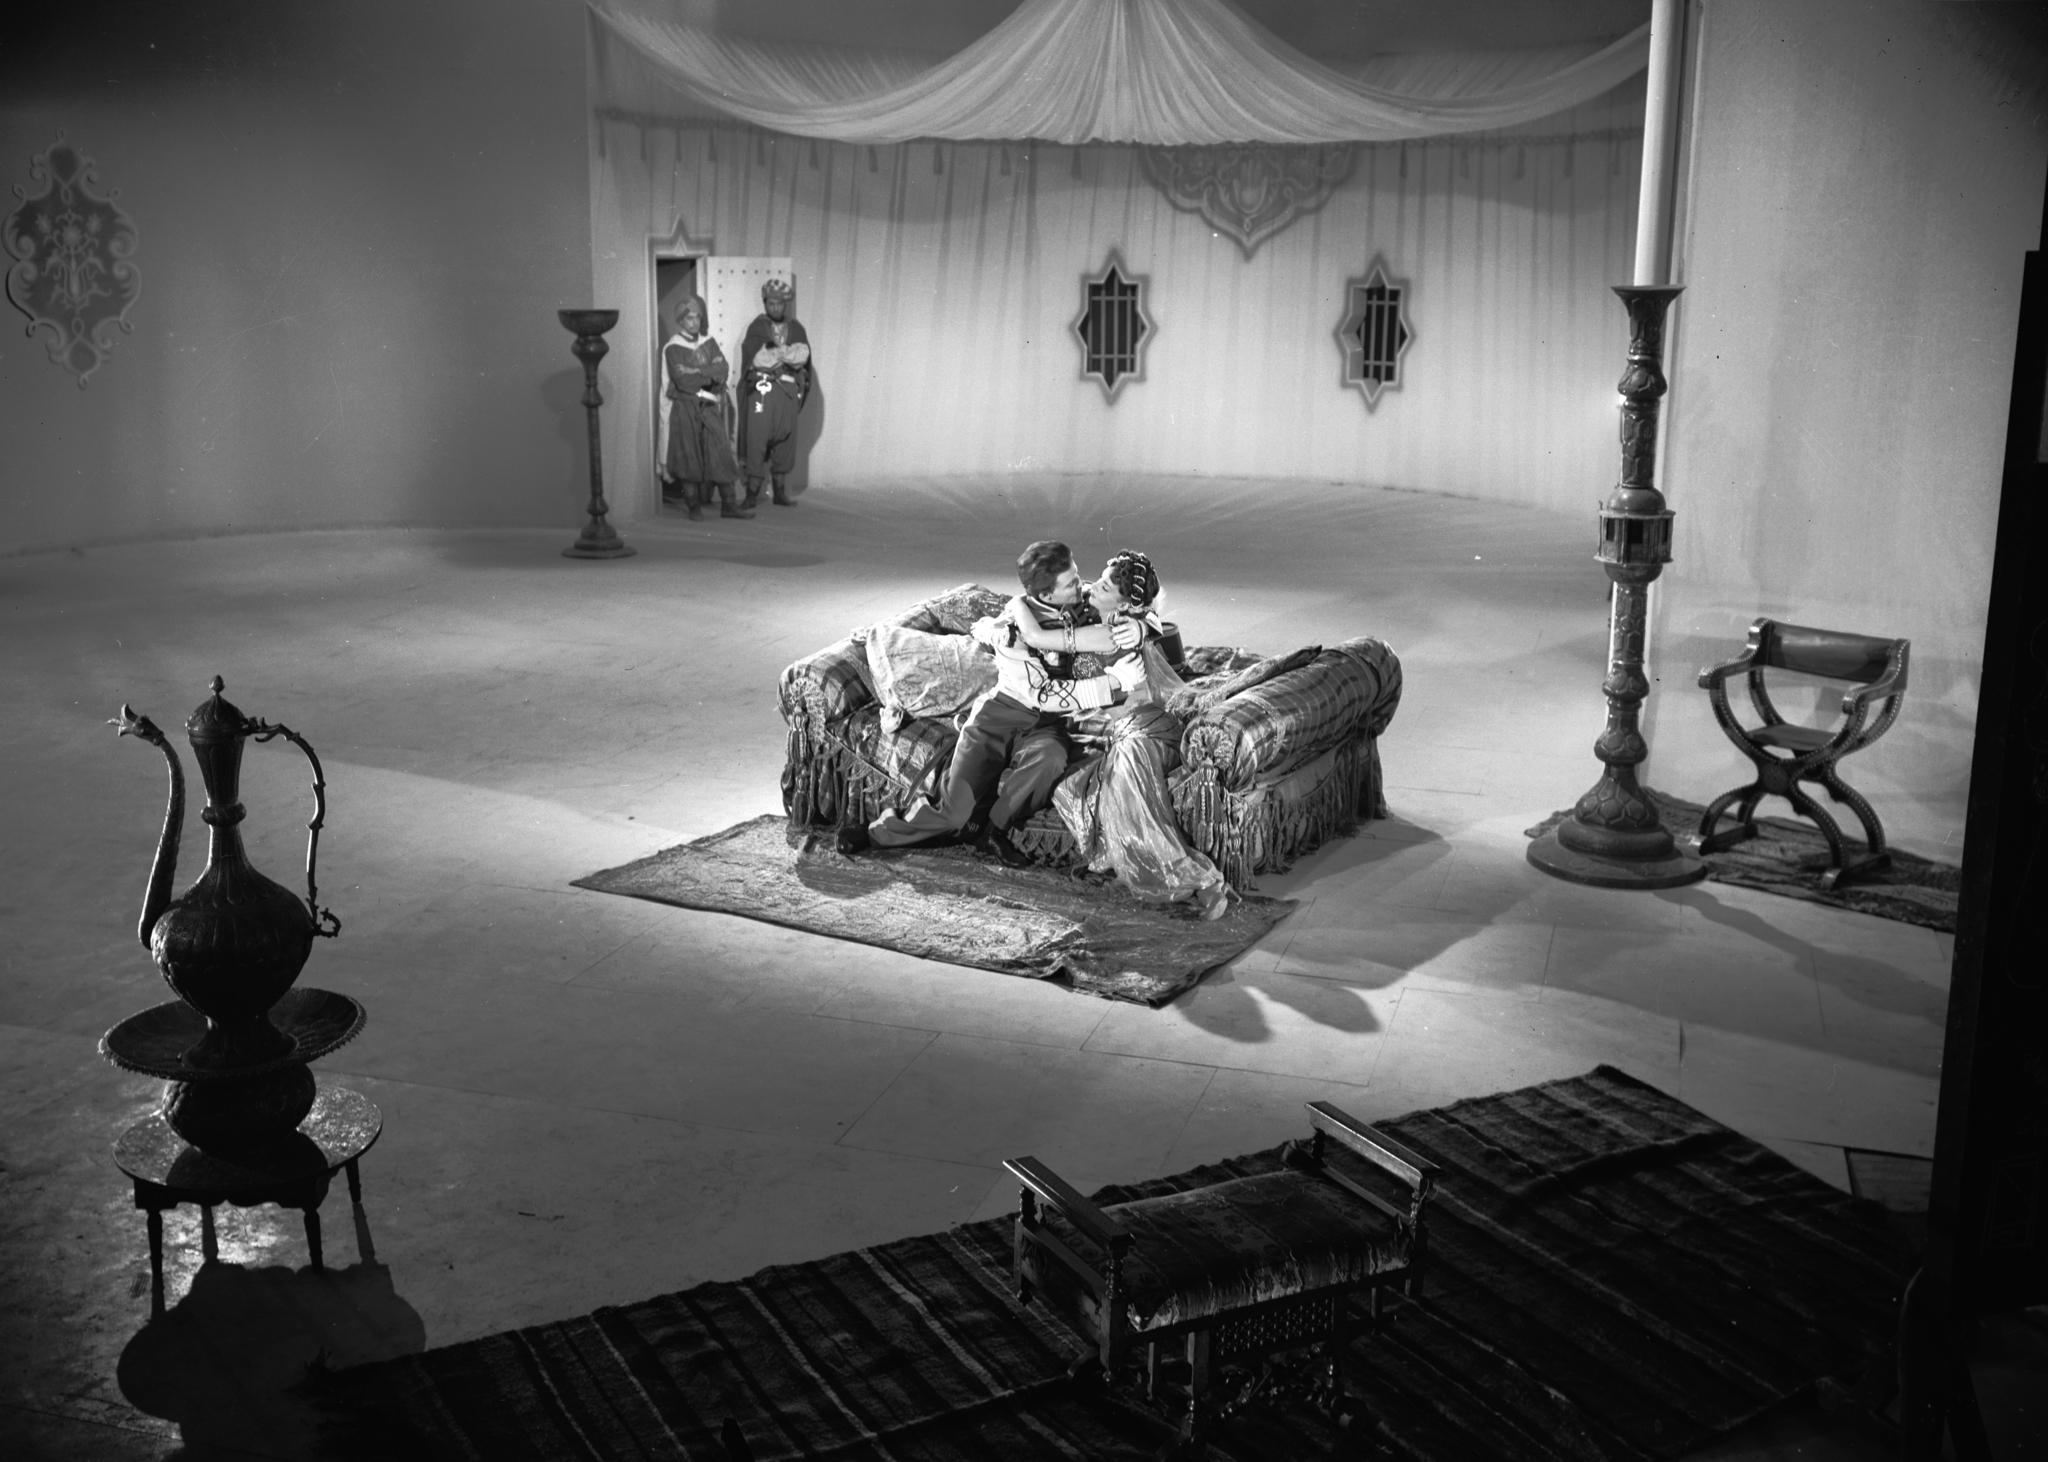 Gina Lollobrigida and Gérard Philipe at an event for Les belles de nuit (1952)